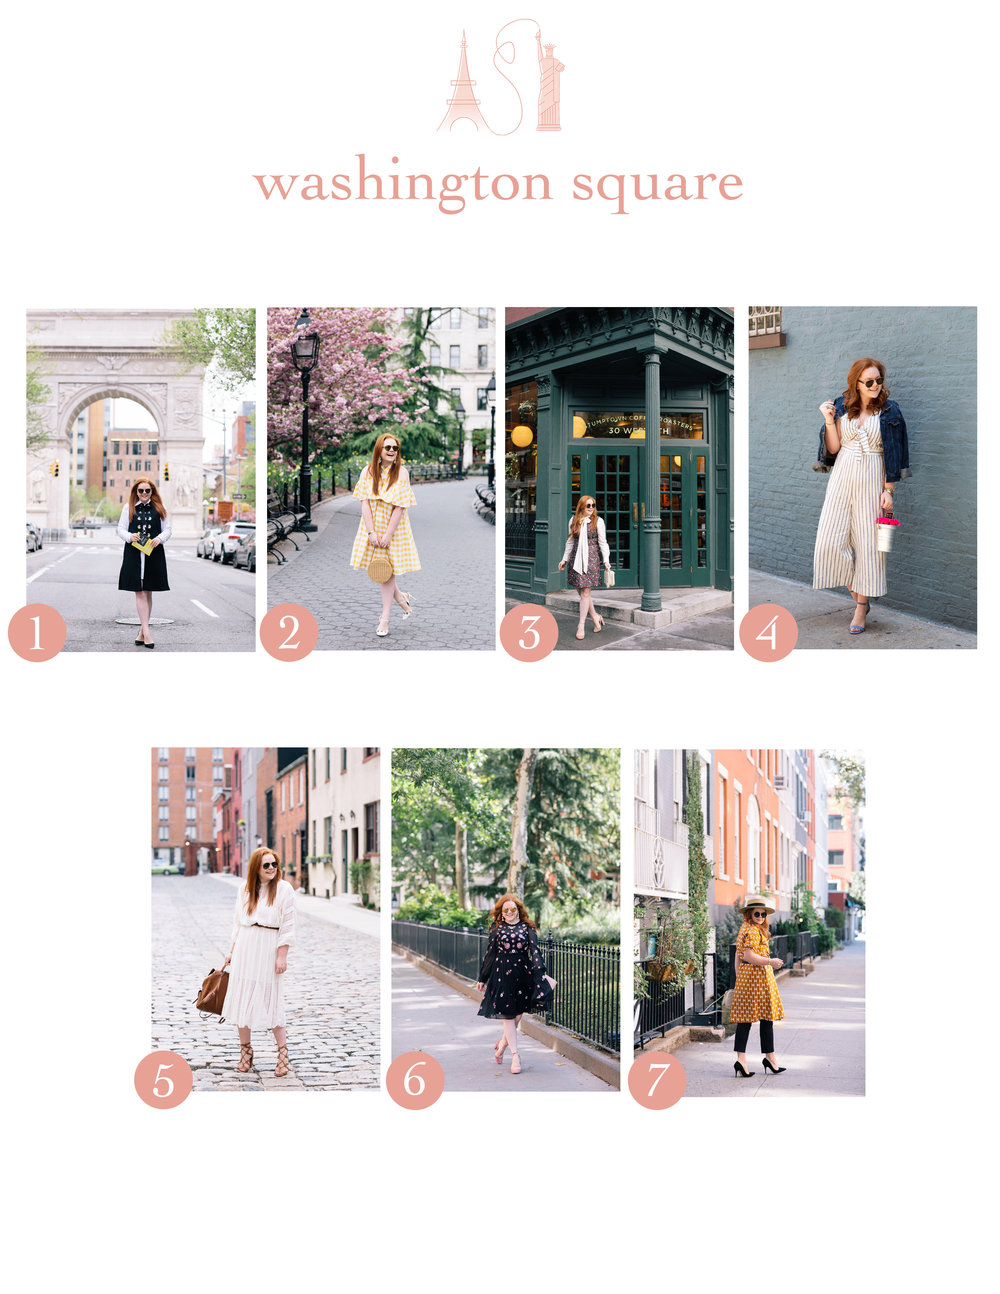 washington_square_photo_locations.jpg